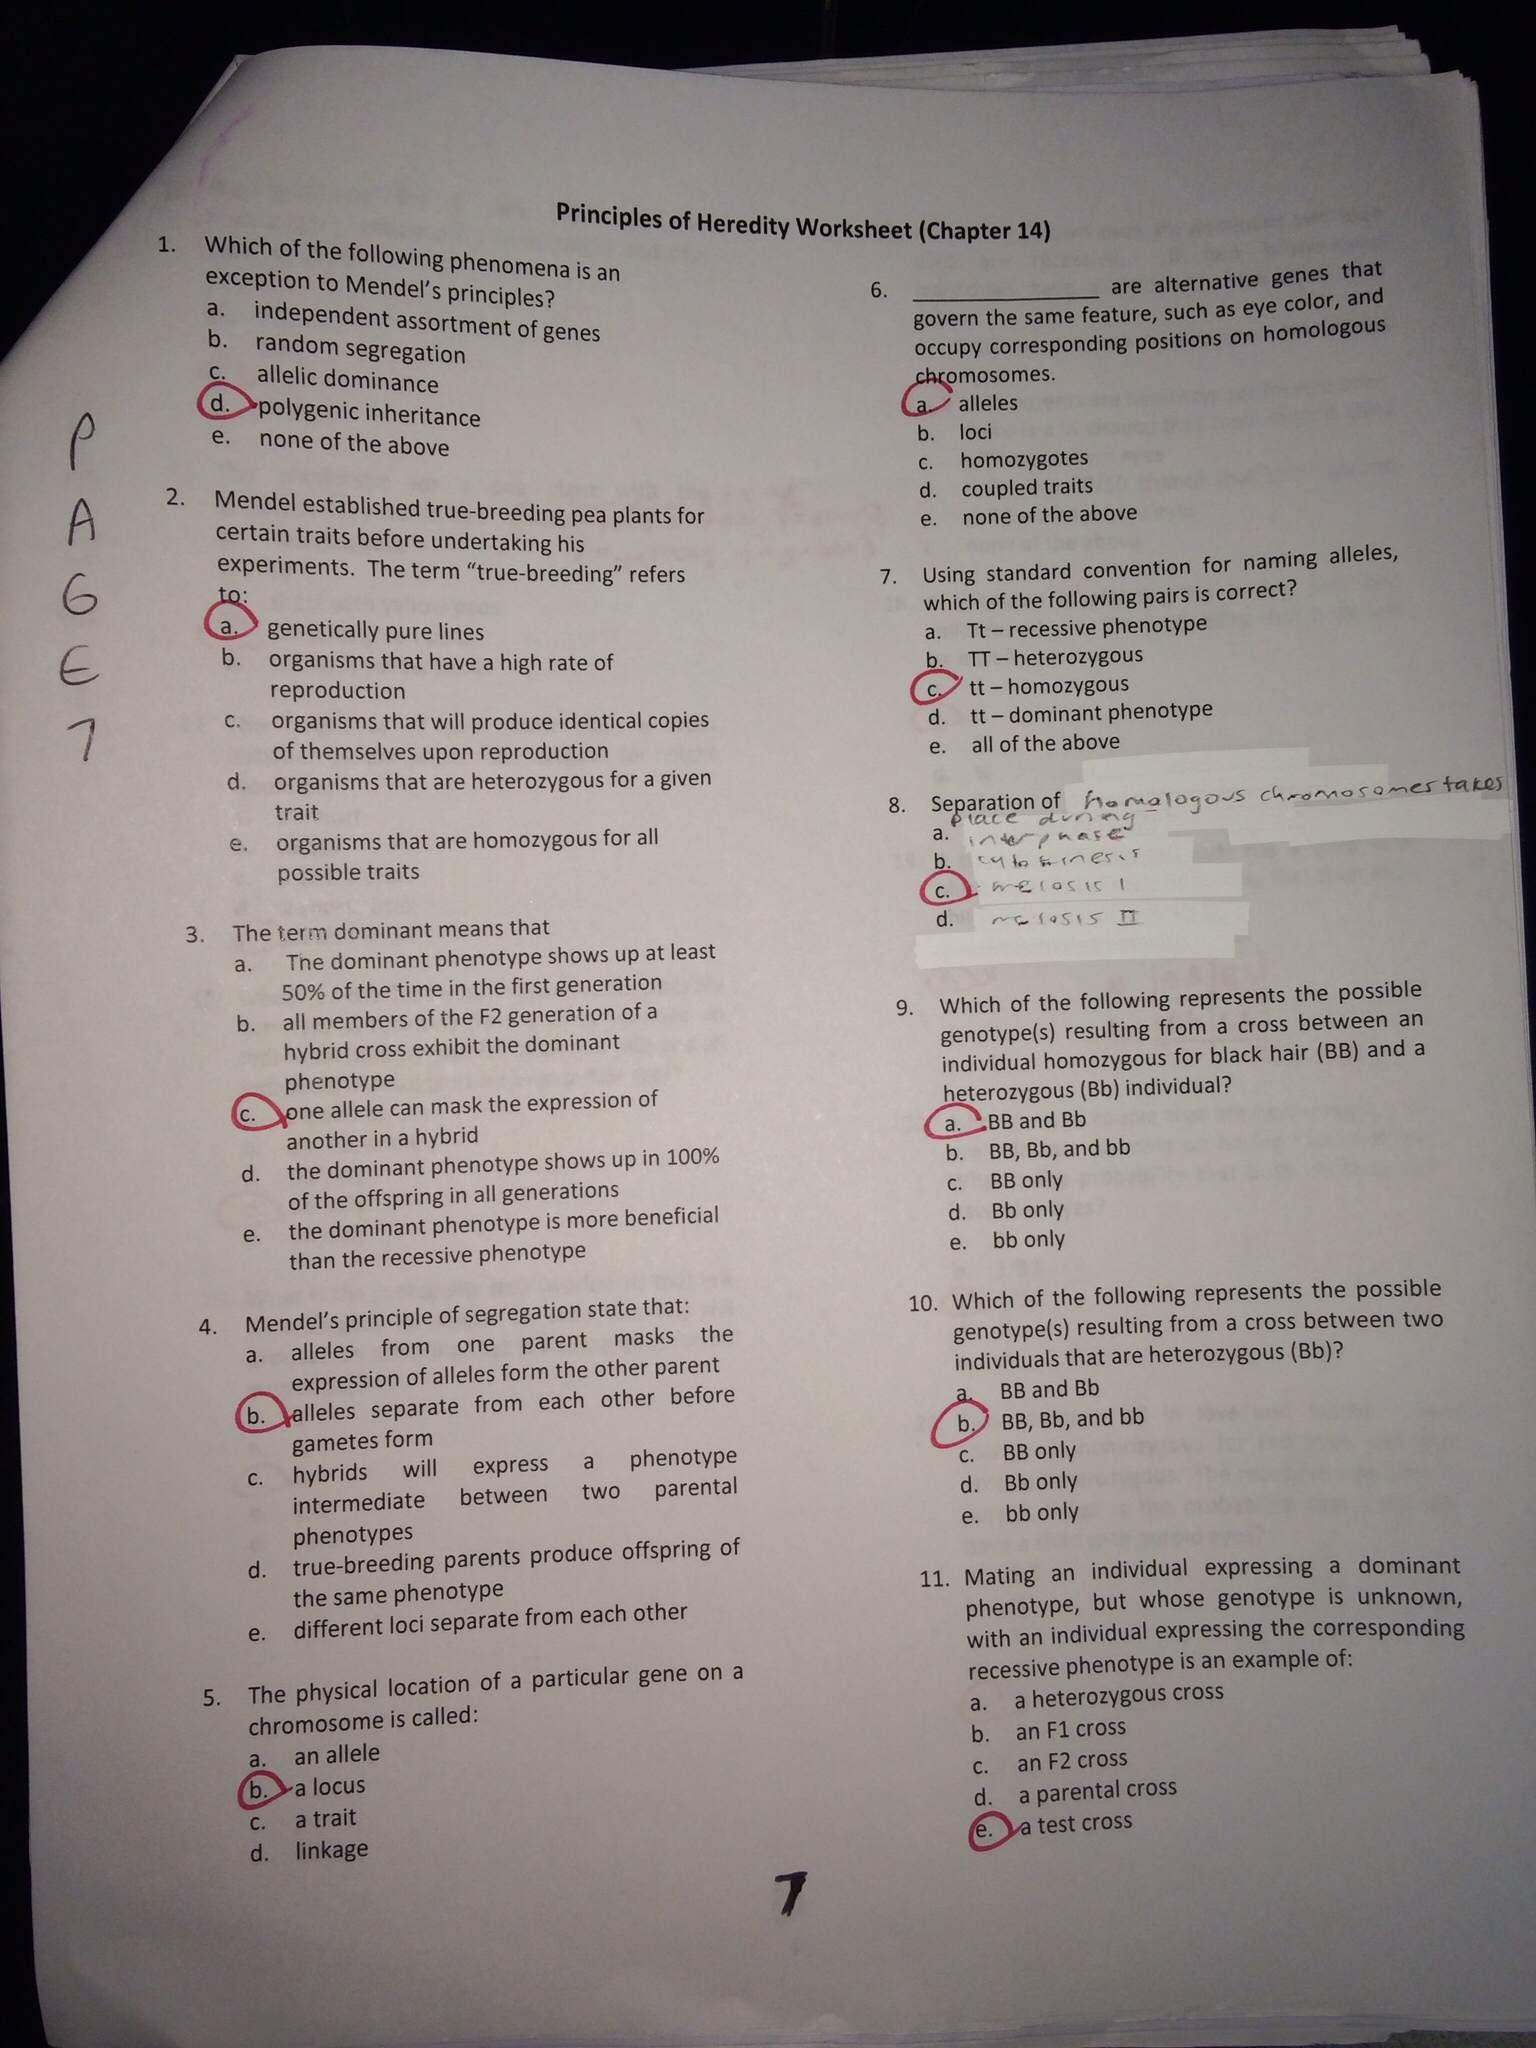 Genetics Practice Problems Worksheet Key Genetics Practice Problems Packet P 6 16 Mrs